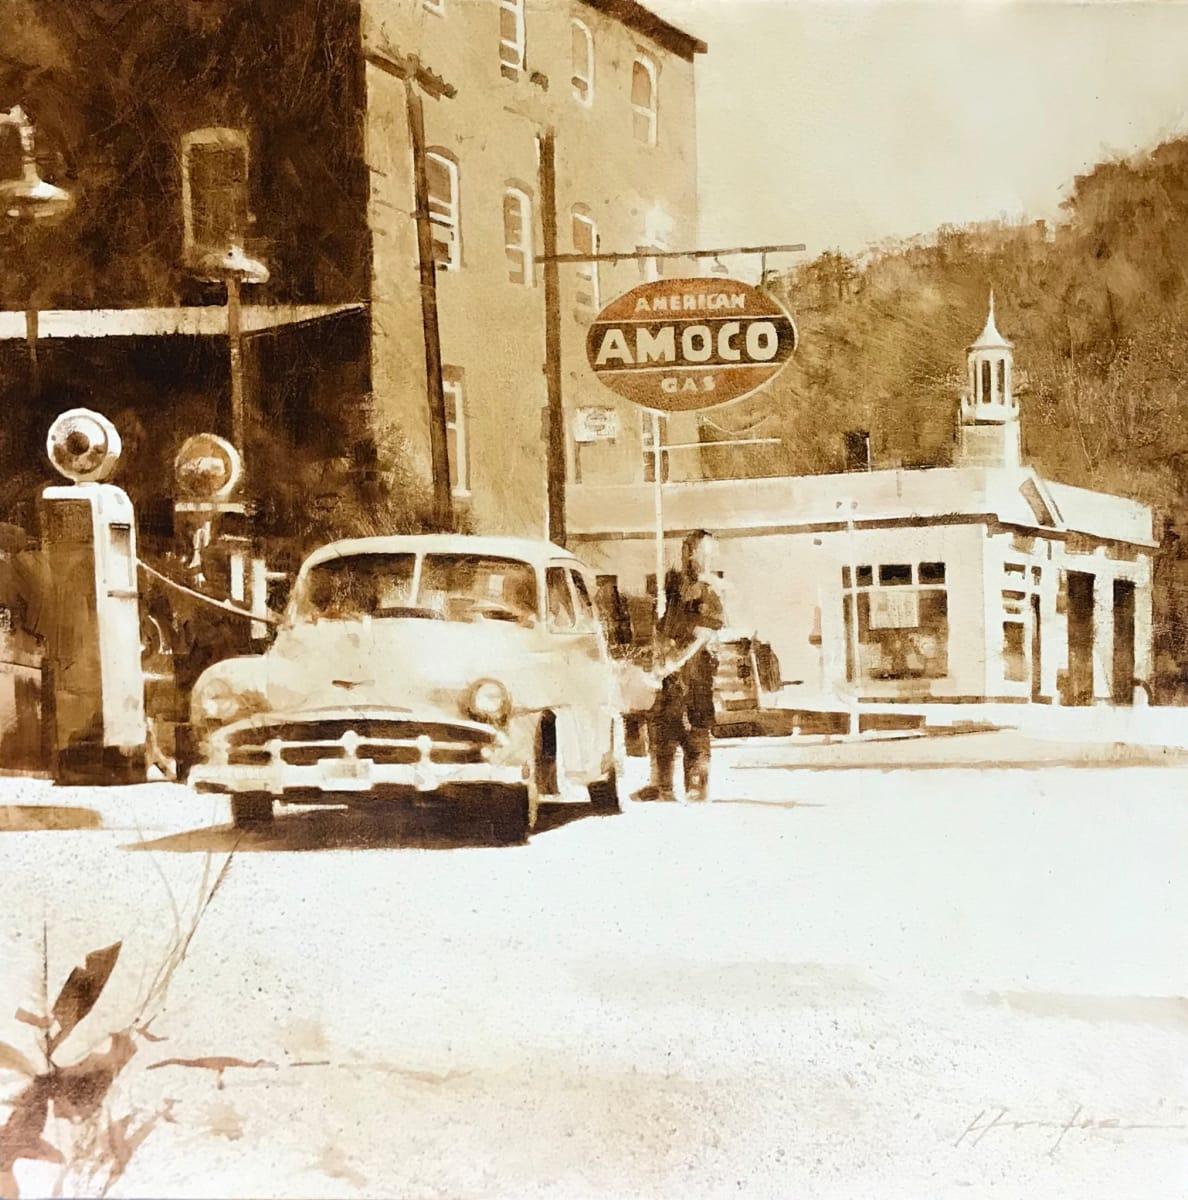 AMOCO, BRIDGE STREET, BELLOWS FALLS VT, EARLY 1950'S by Charlie Hunter